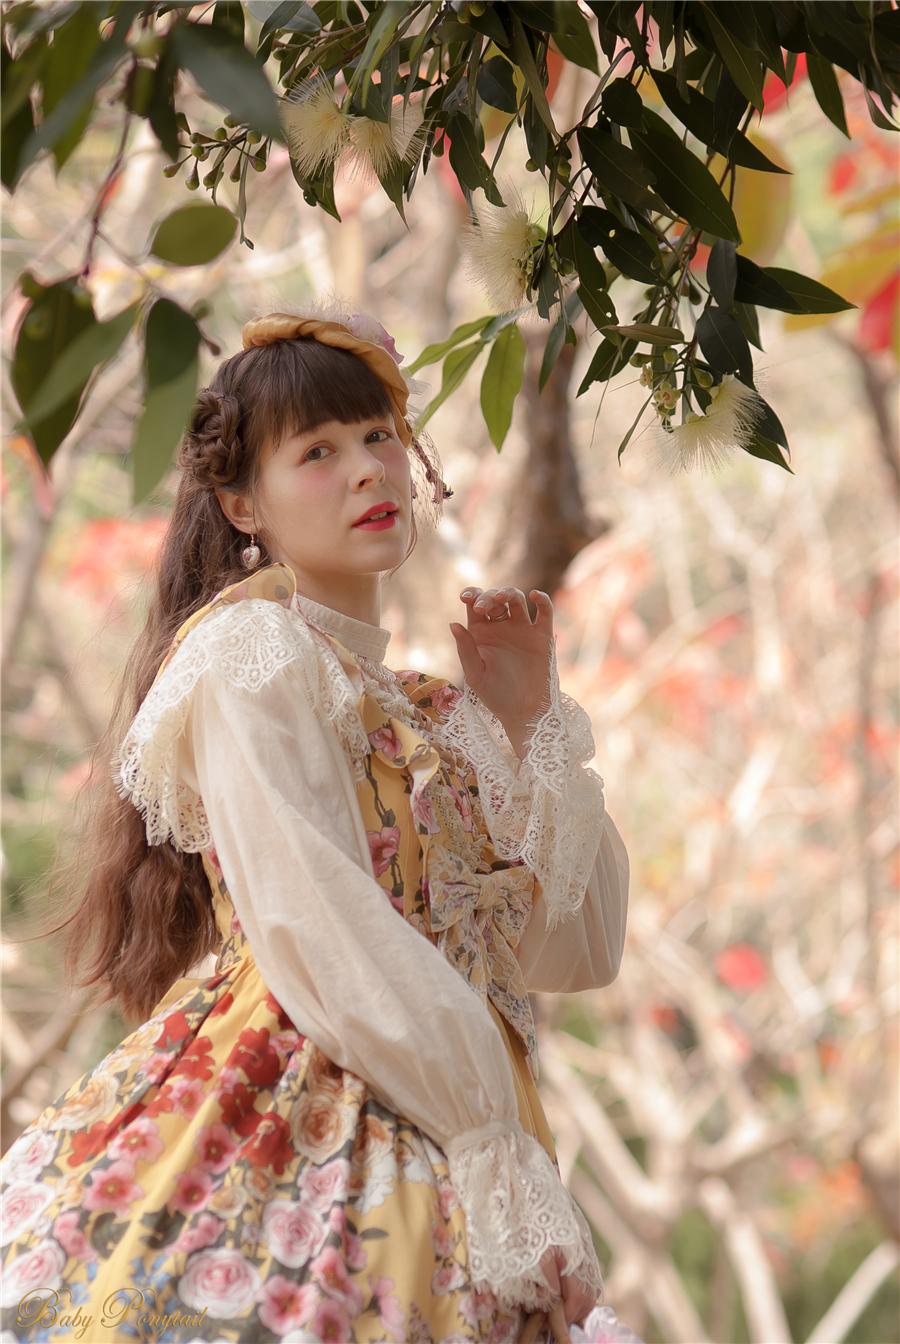 Baby Ponytail_Model Photo_Polly's Garden of Dreams_JSK Yellow_Claudia_1.jpg